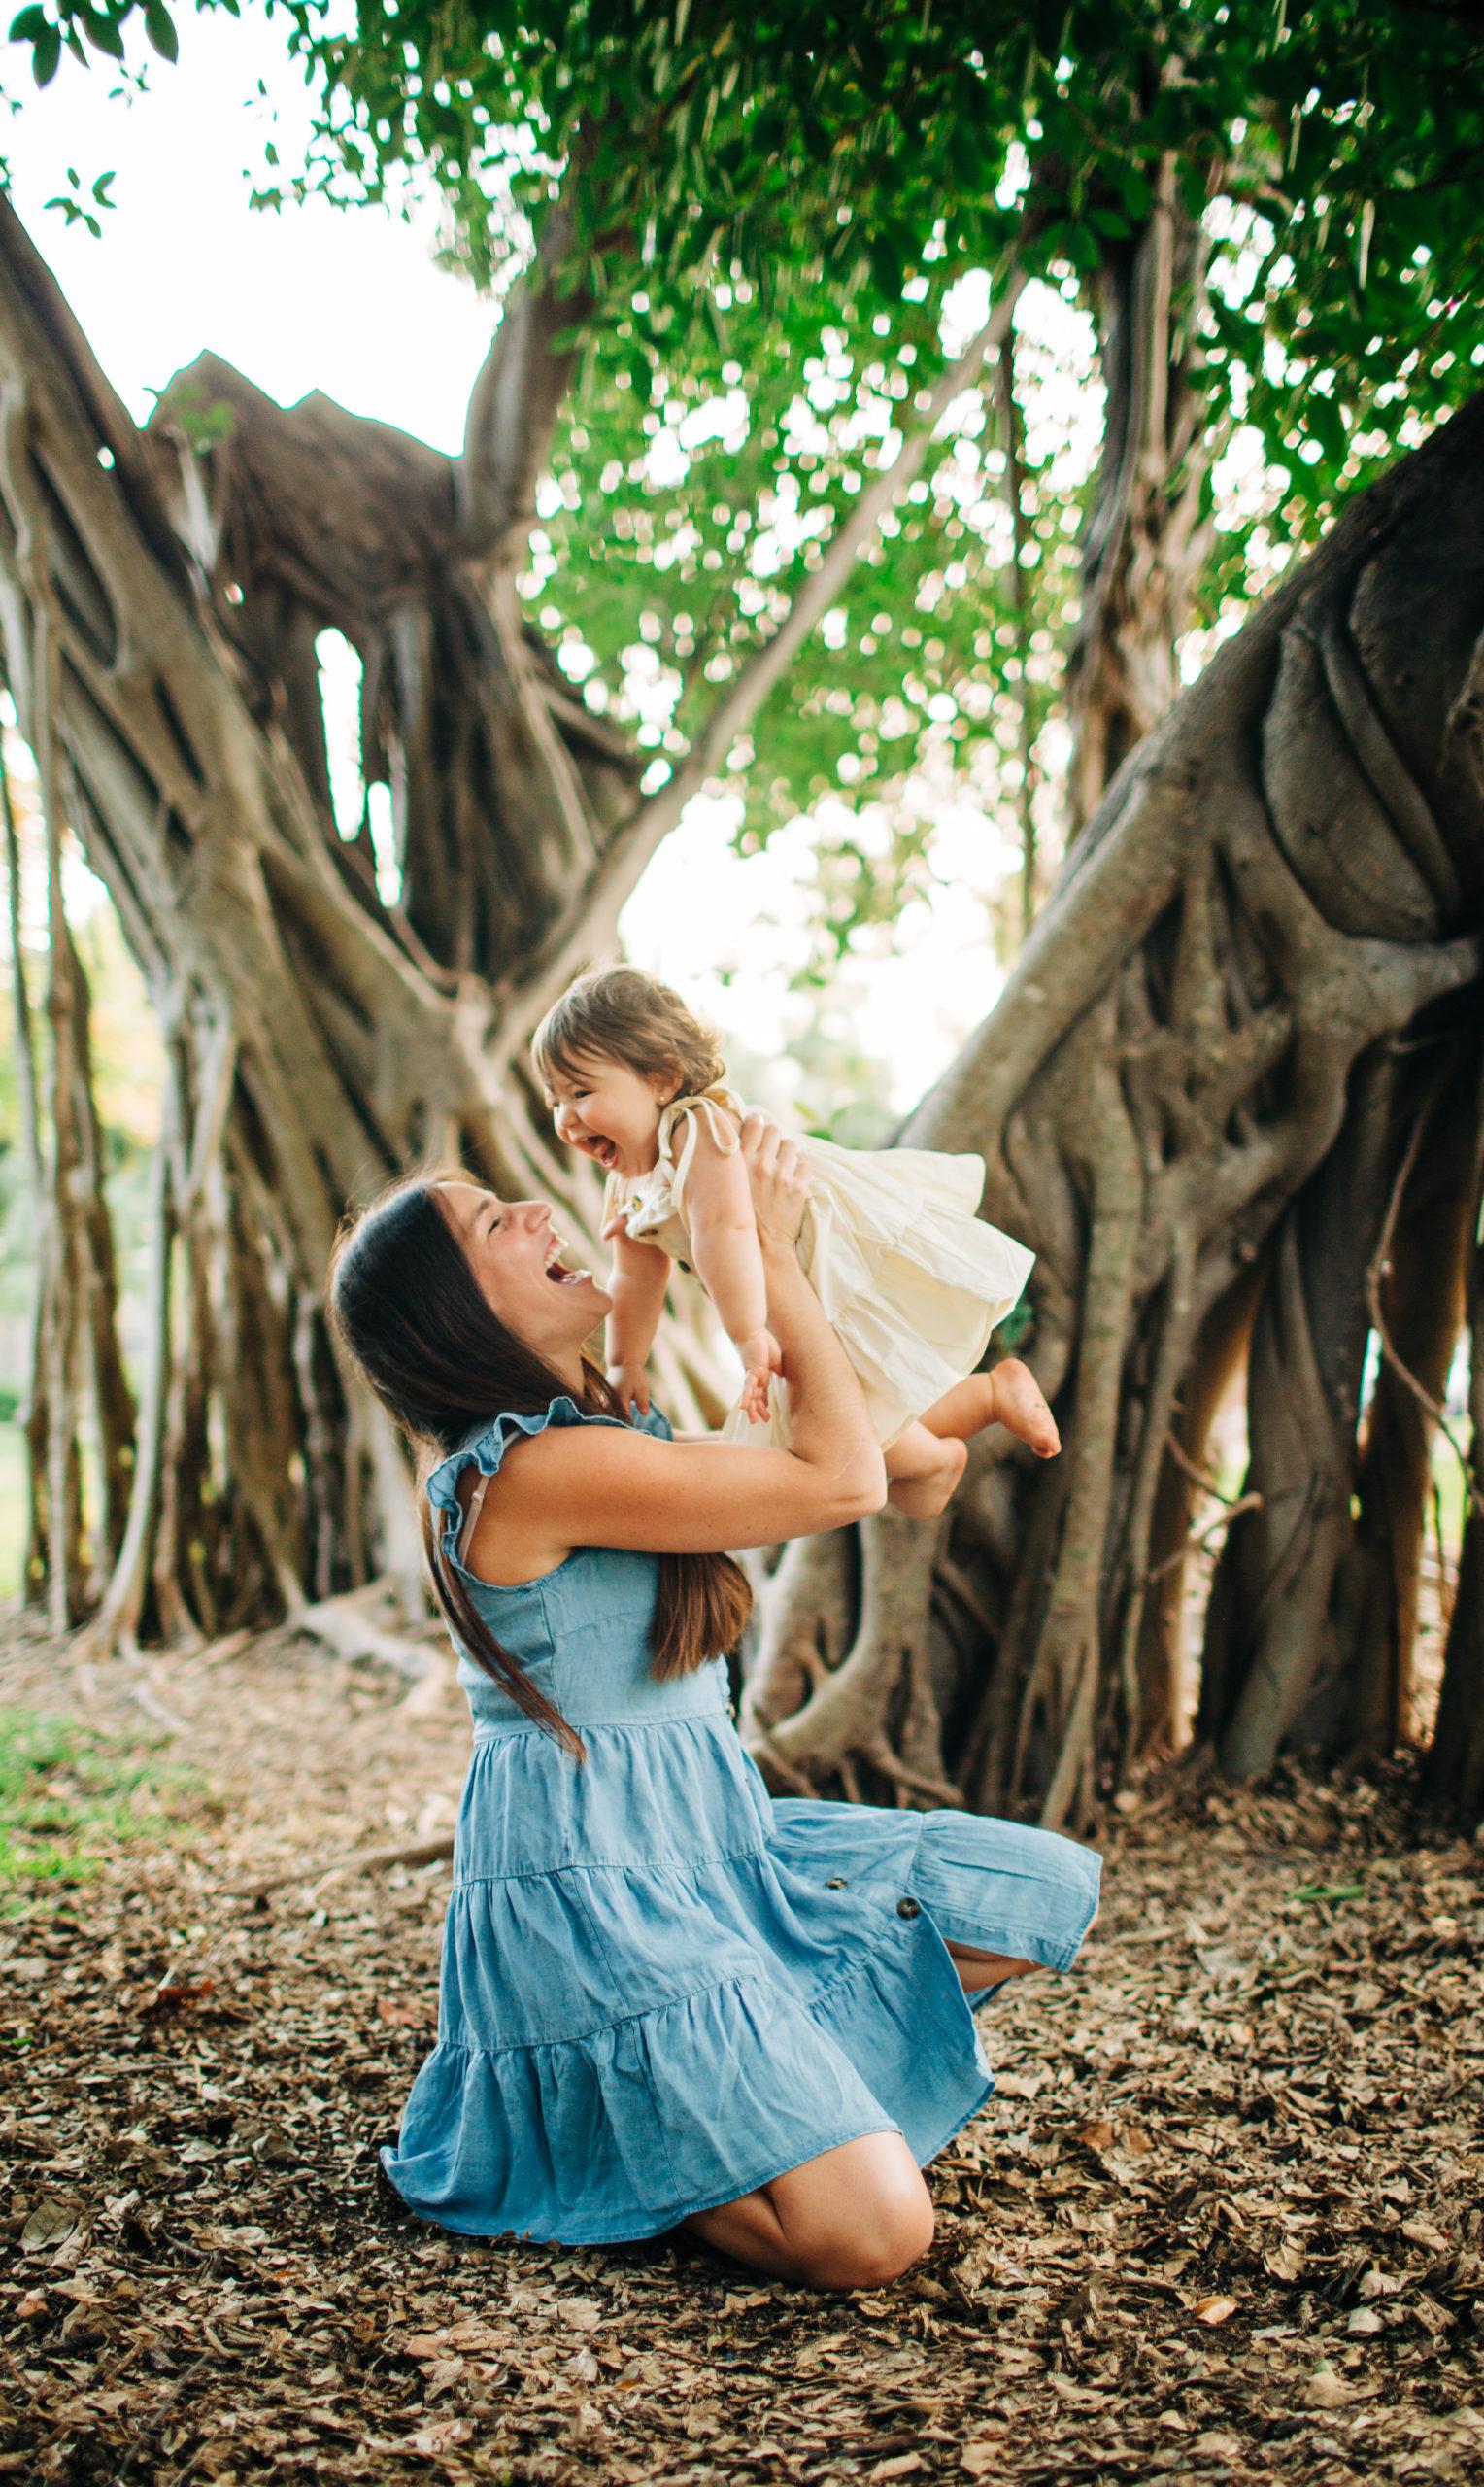 MotherhoodSession_Miami-11-scaled Miami's 8 best Photoshoot Locations